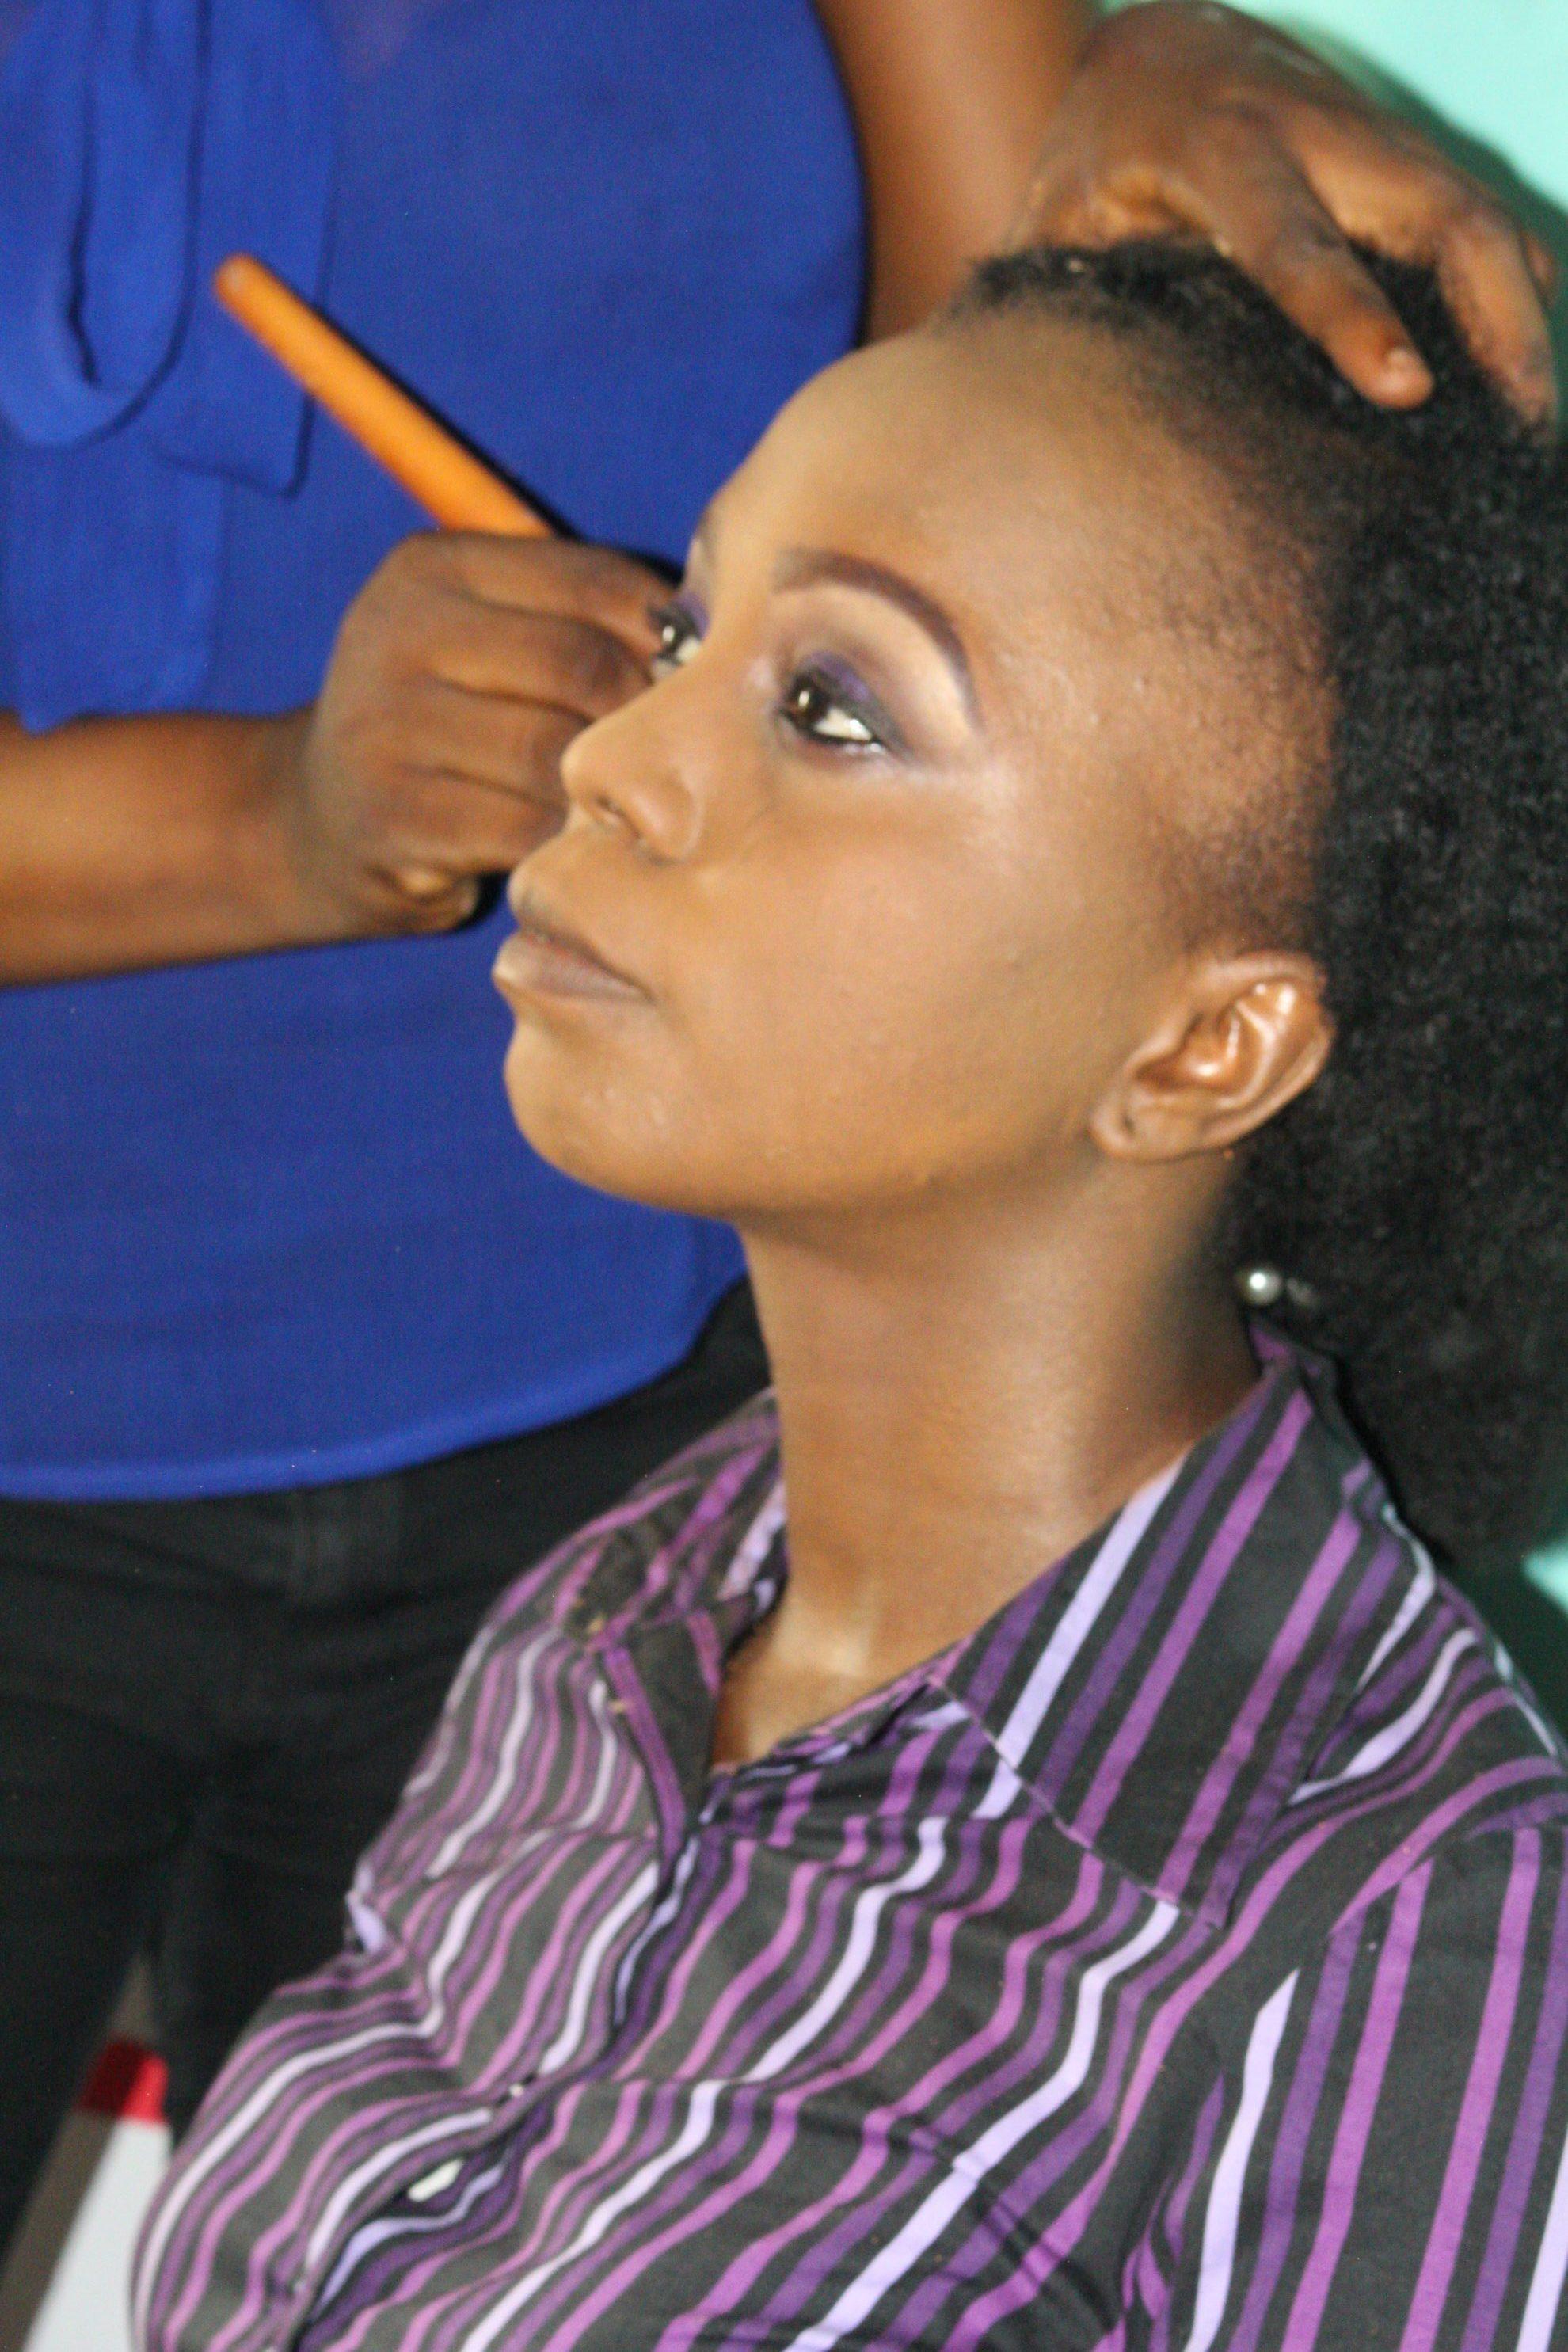 Cakasa Ebenezer Trains Widows And Vulnerable Women On Life Skills